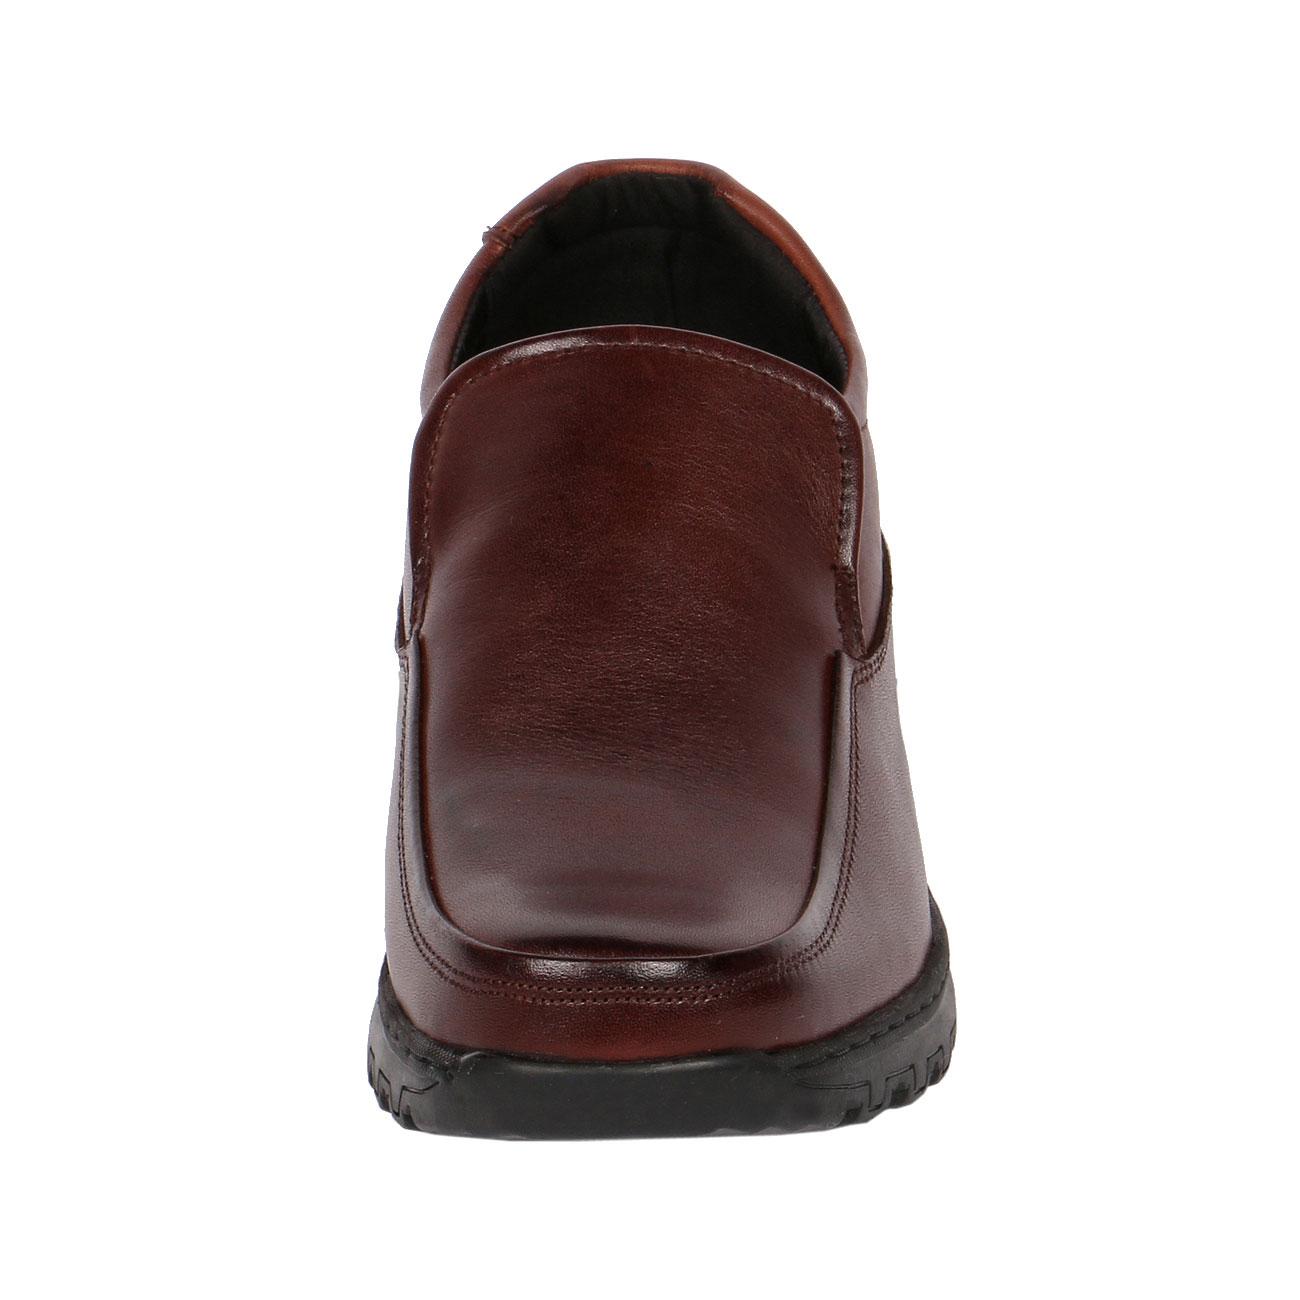 Men's Combination Semi Dress & Casual Shoes 3